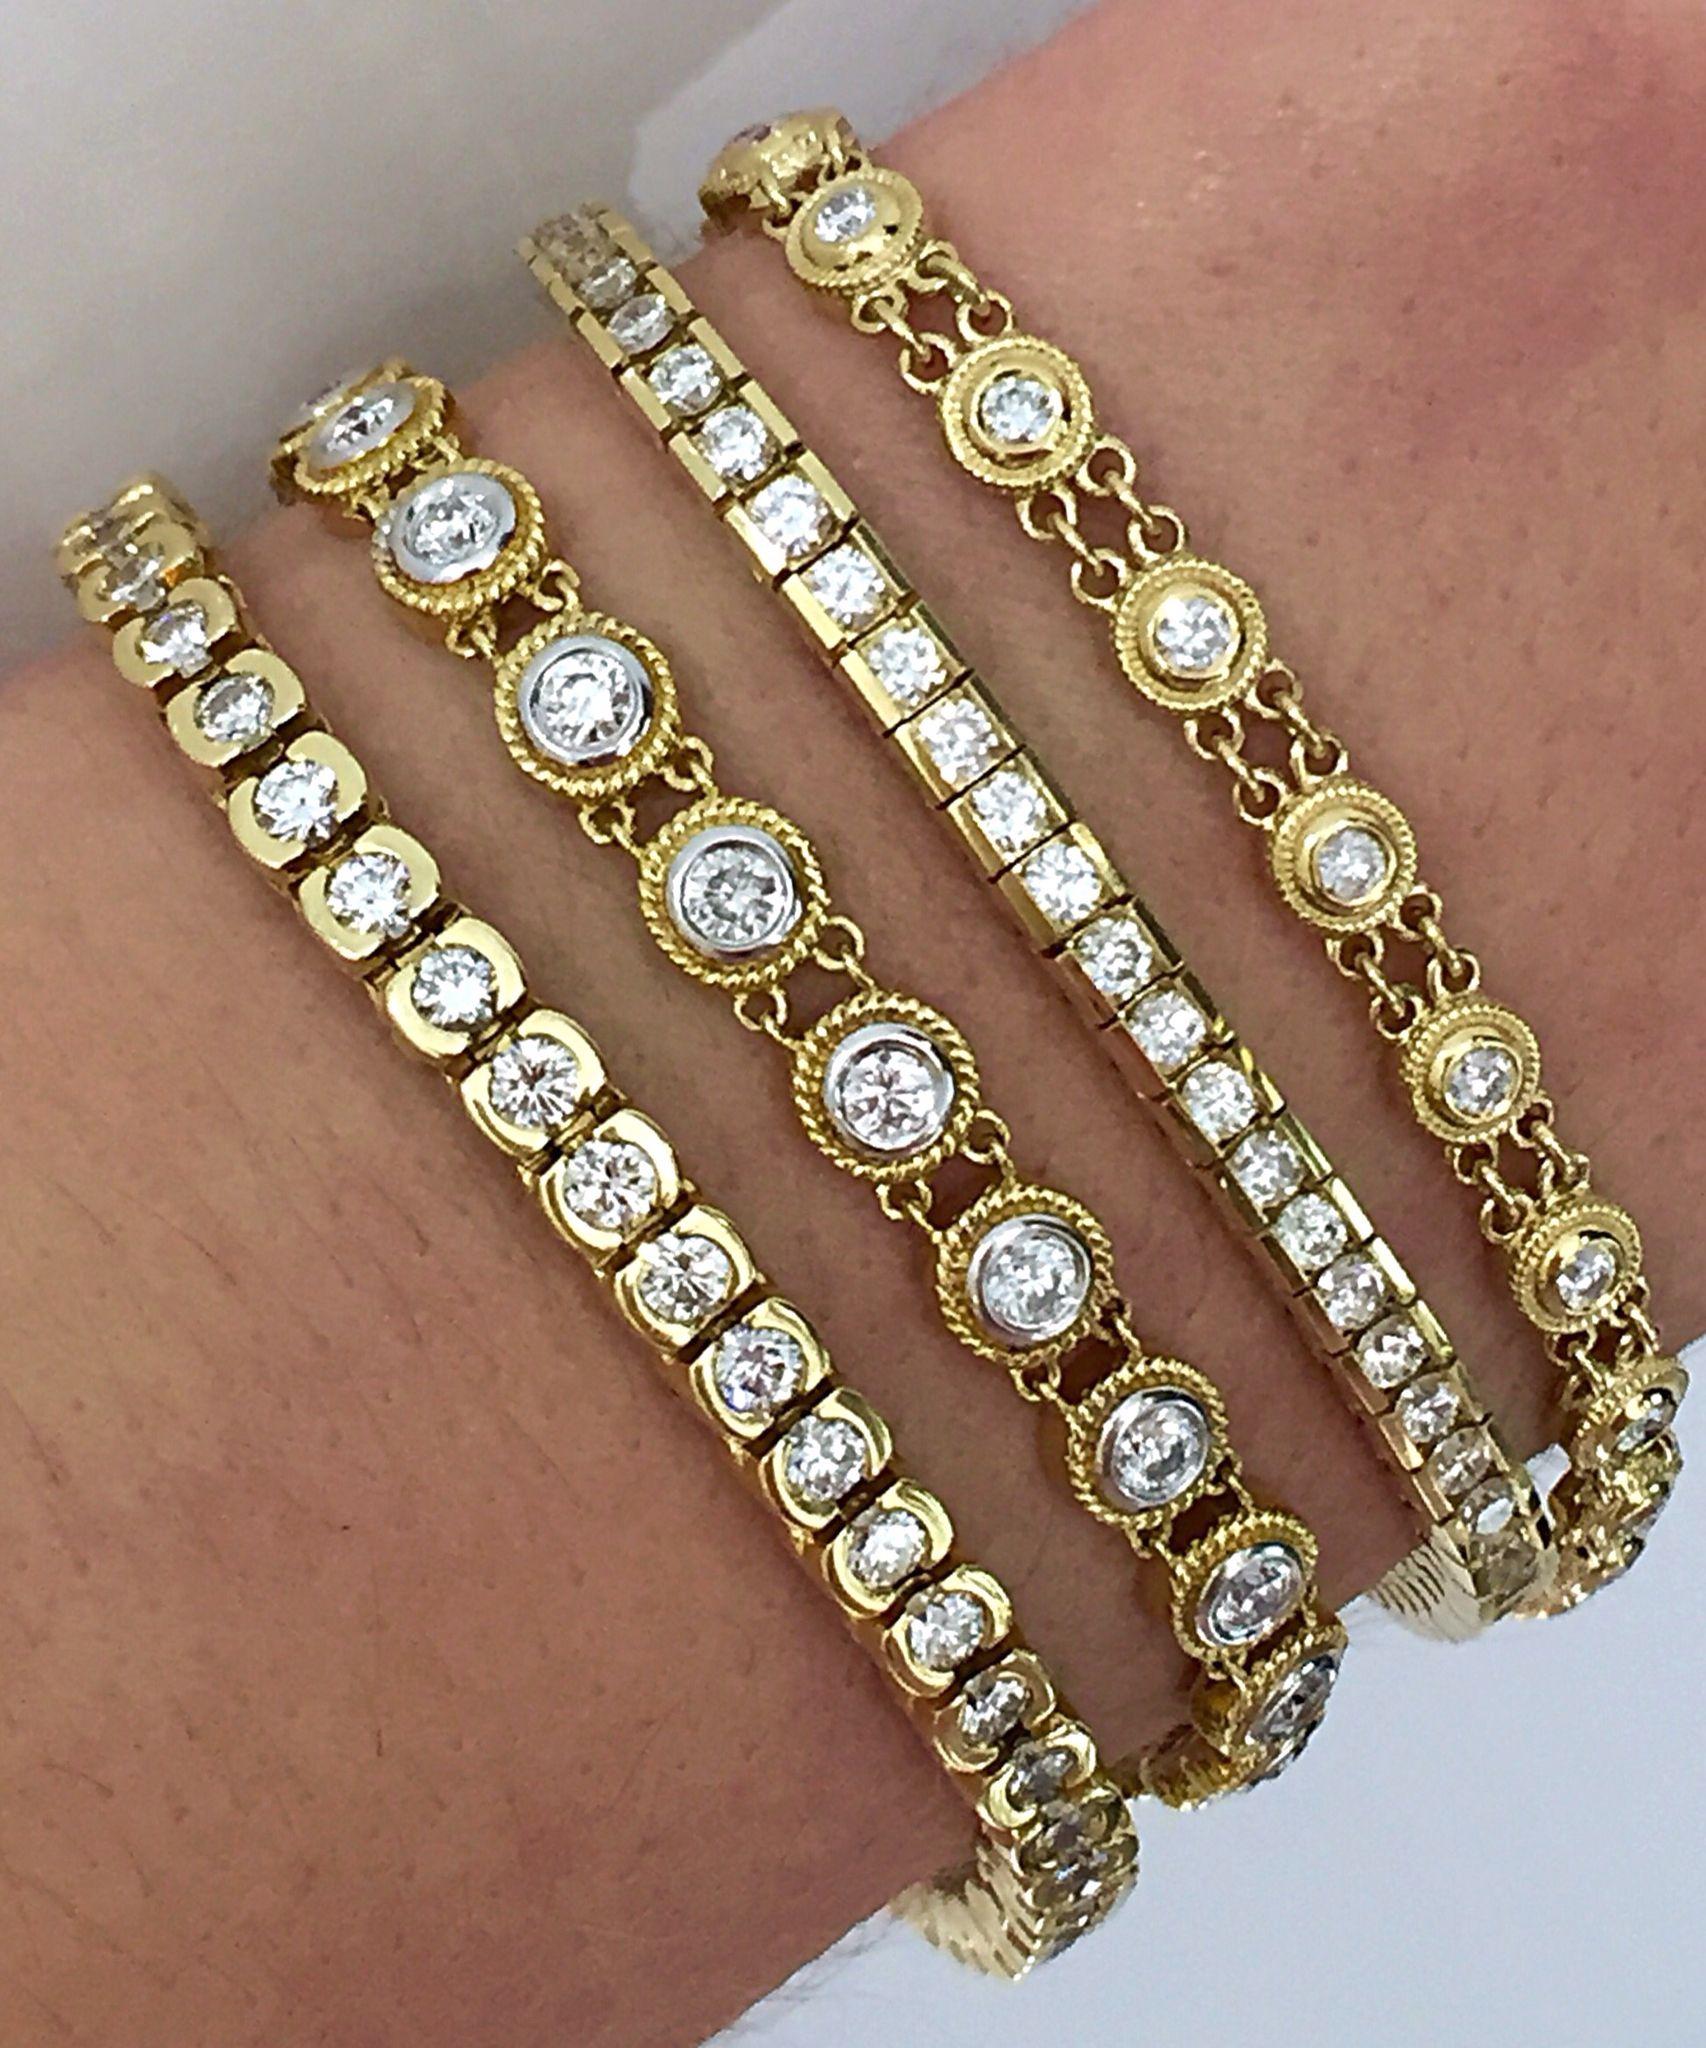 Burdeen S Jewelry Diamond Bracelet Design Tennis Bracelet Diamond Sparkly Bracelets